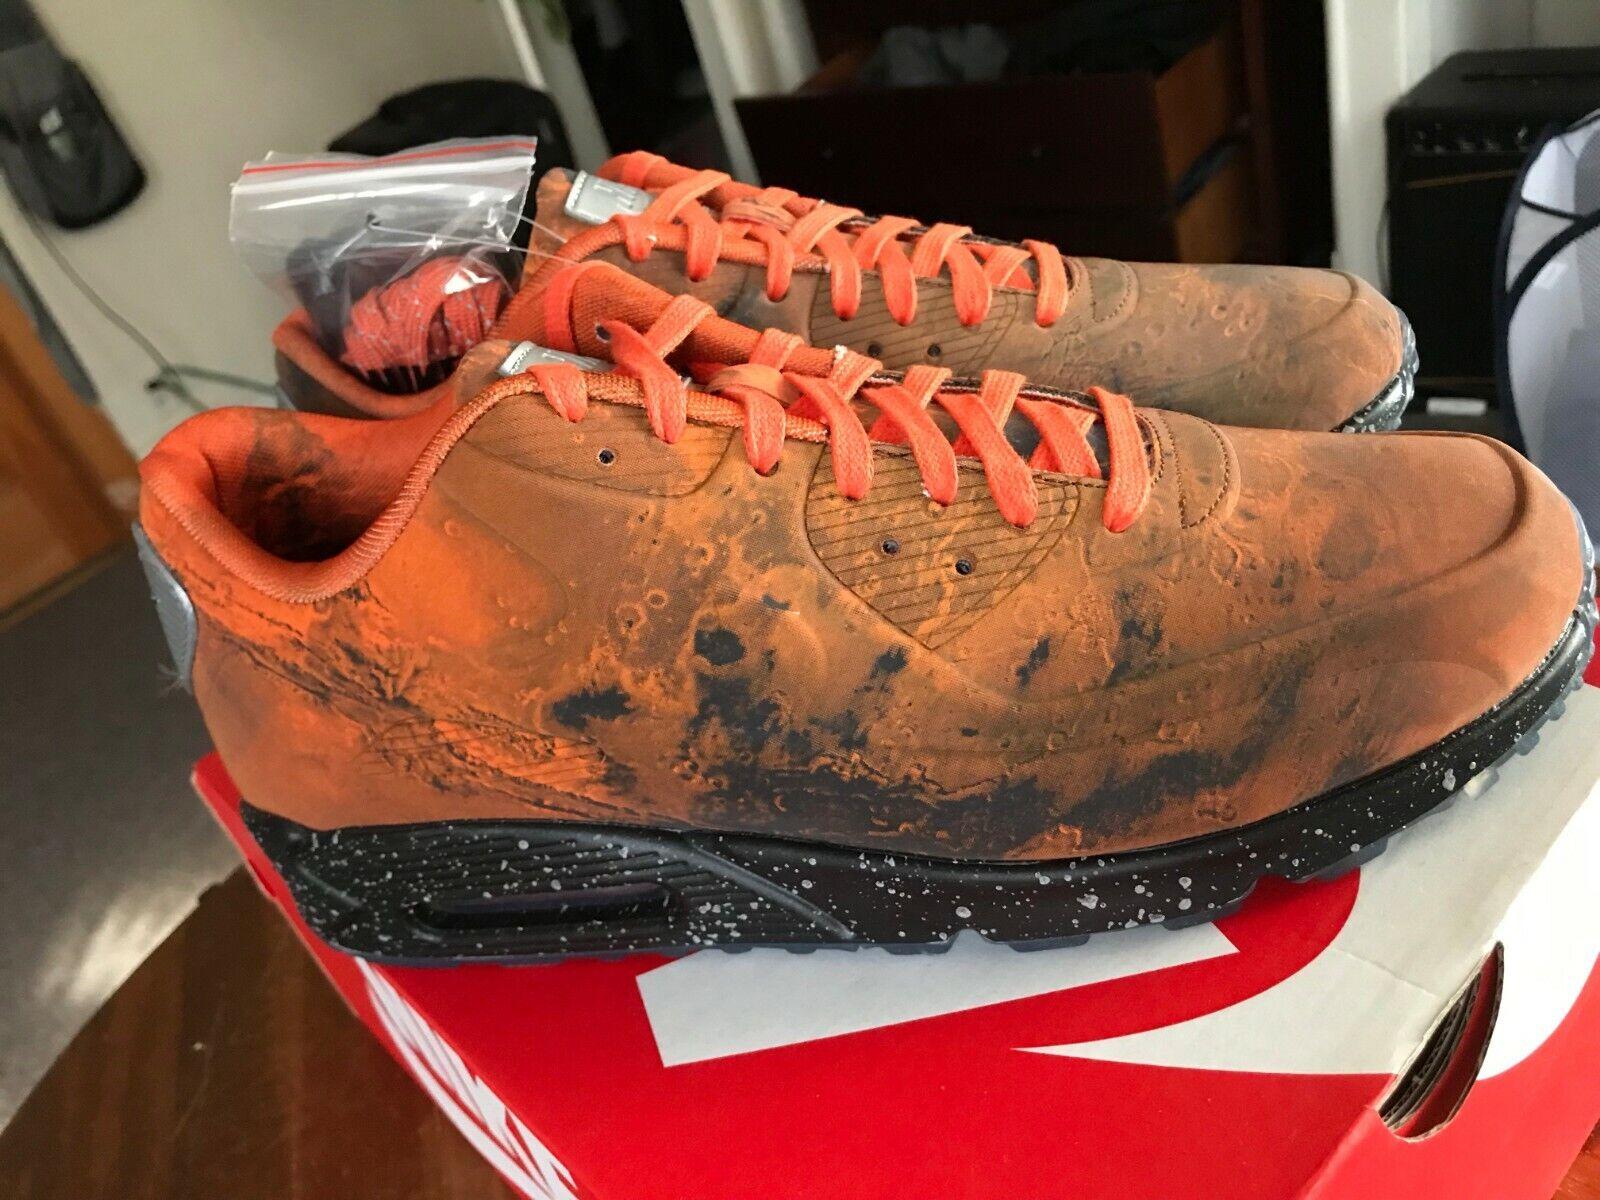 d62ccfc5fb7 Nike AIR MAX 90 QS Size 11 LANDING MARS nxdbnd631-Athletic Shoes